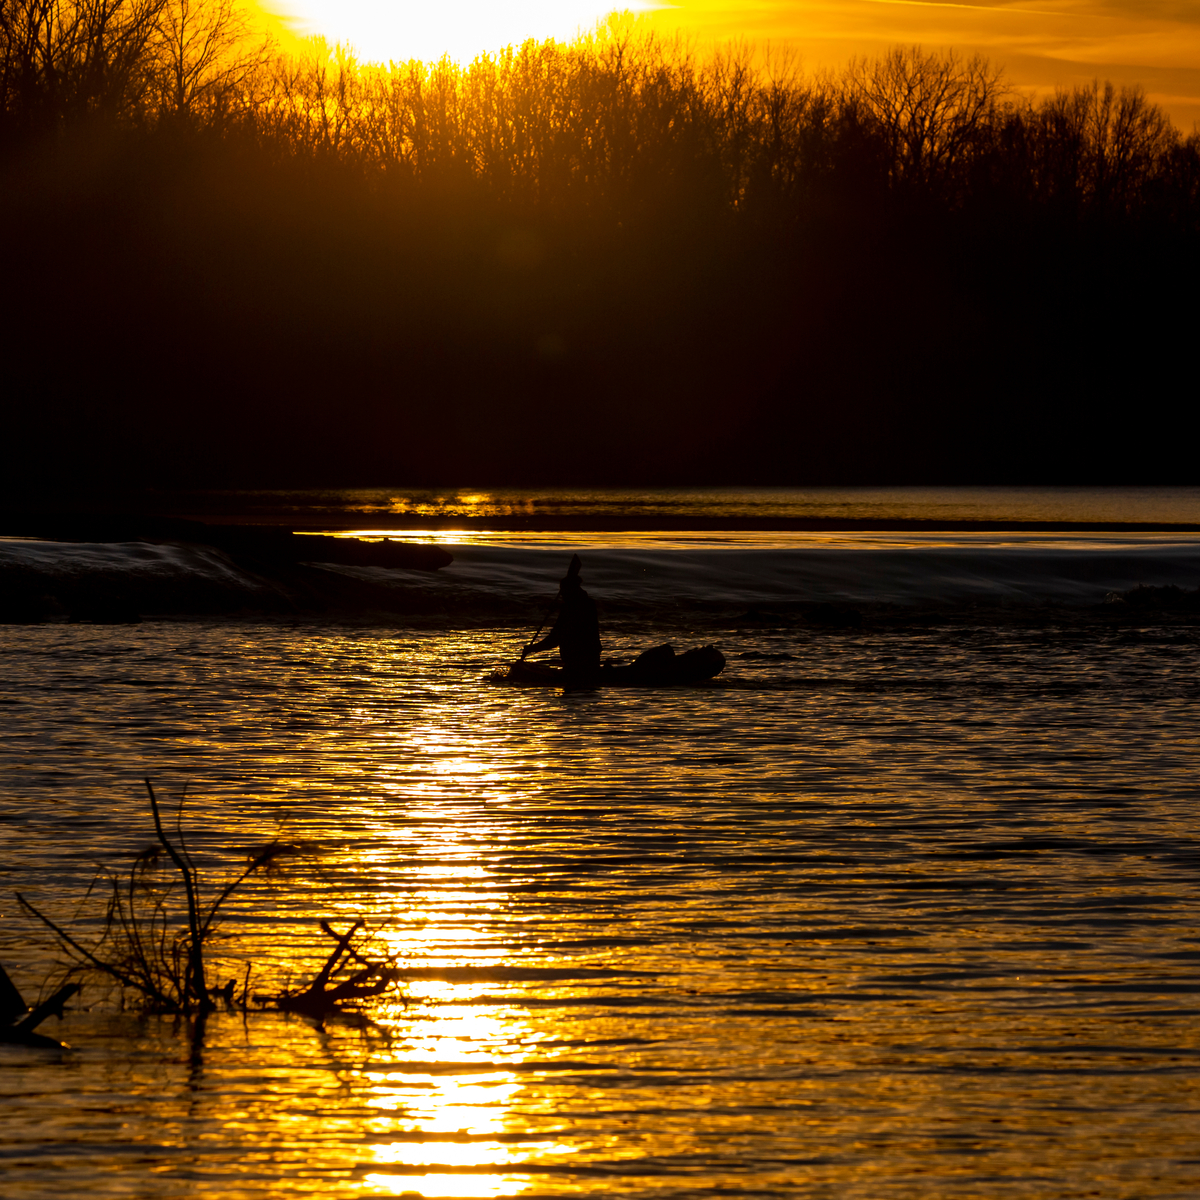 Kayaking on the Missouri River